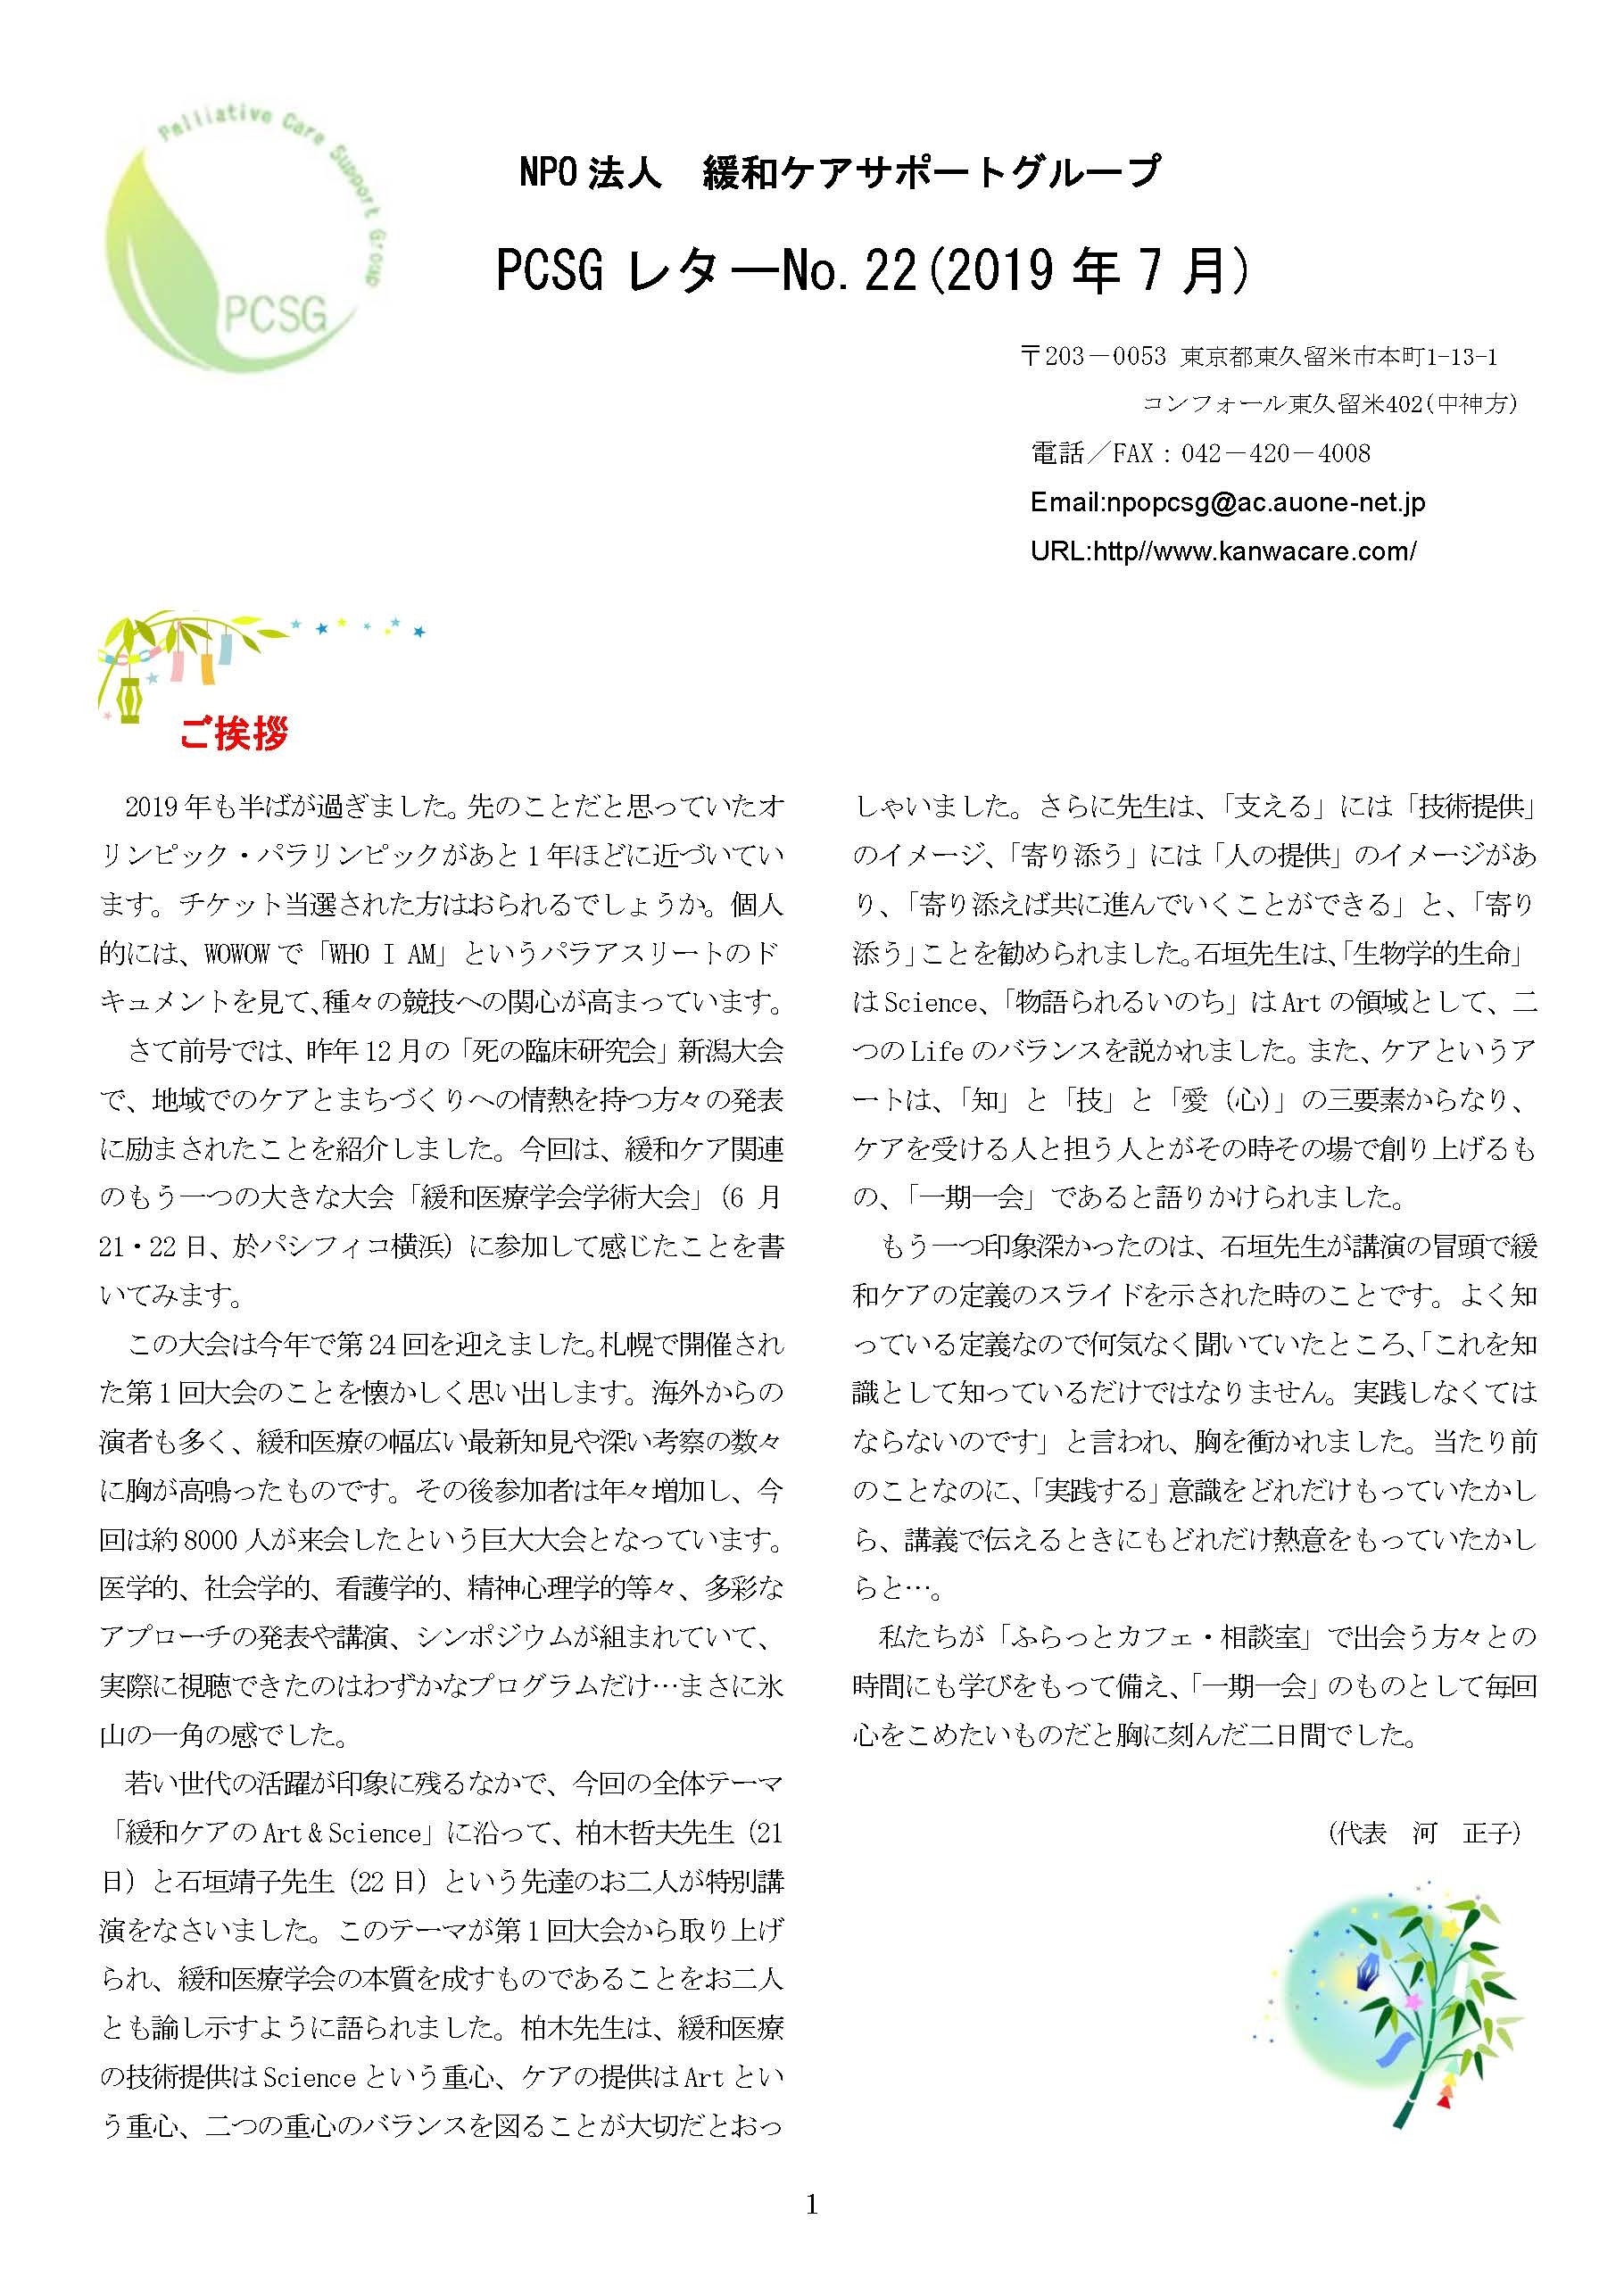 PCSGレター No.22(2019.7 第22号発行)_e0167087_05115890.jpg